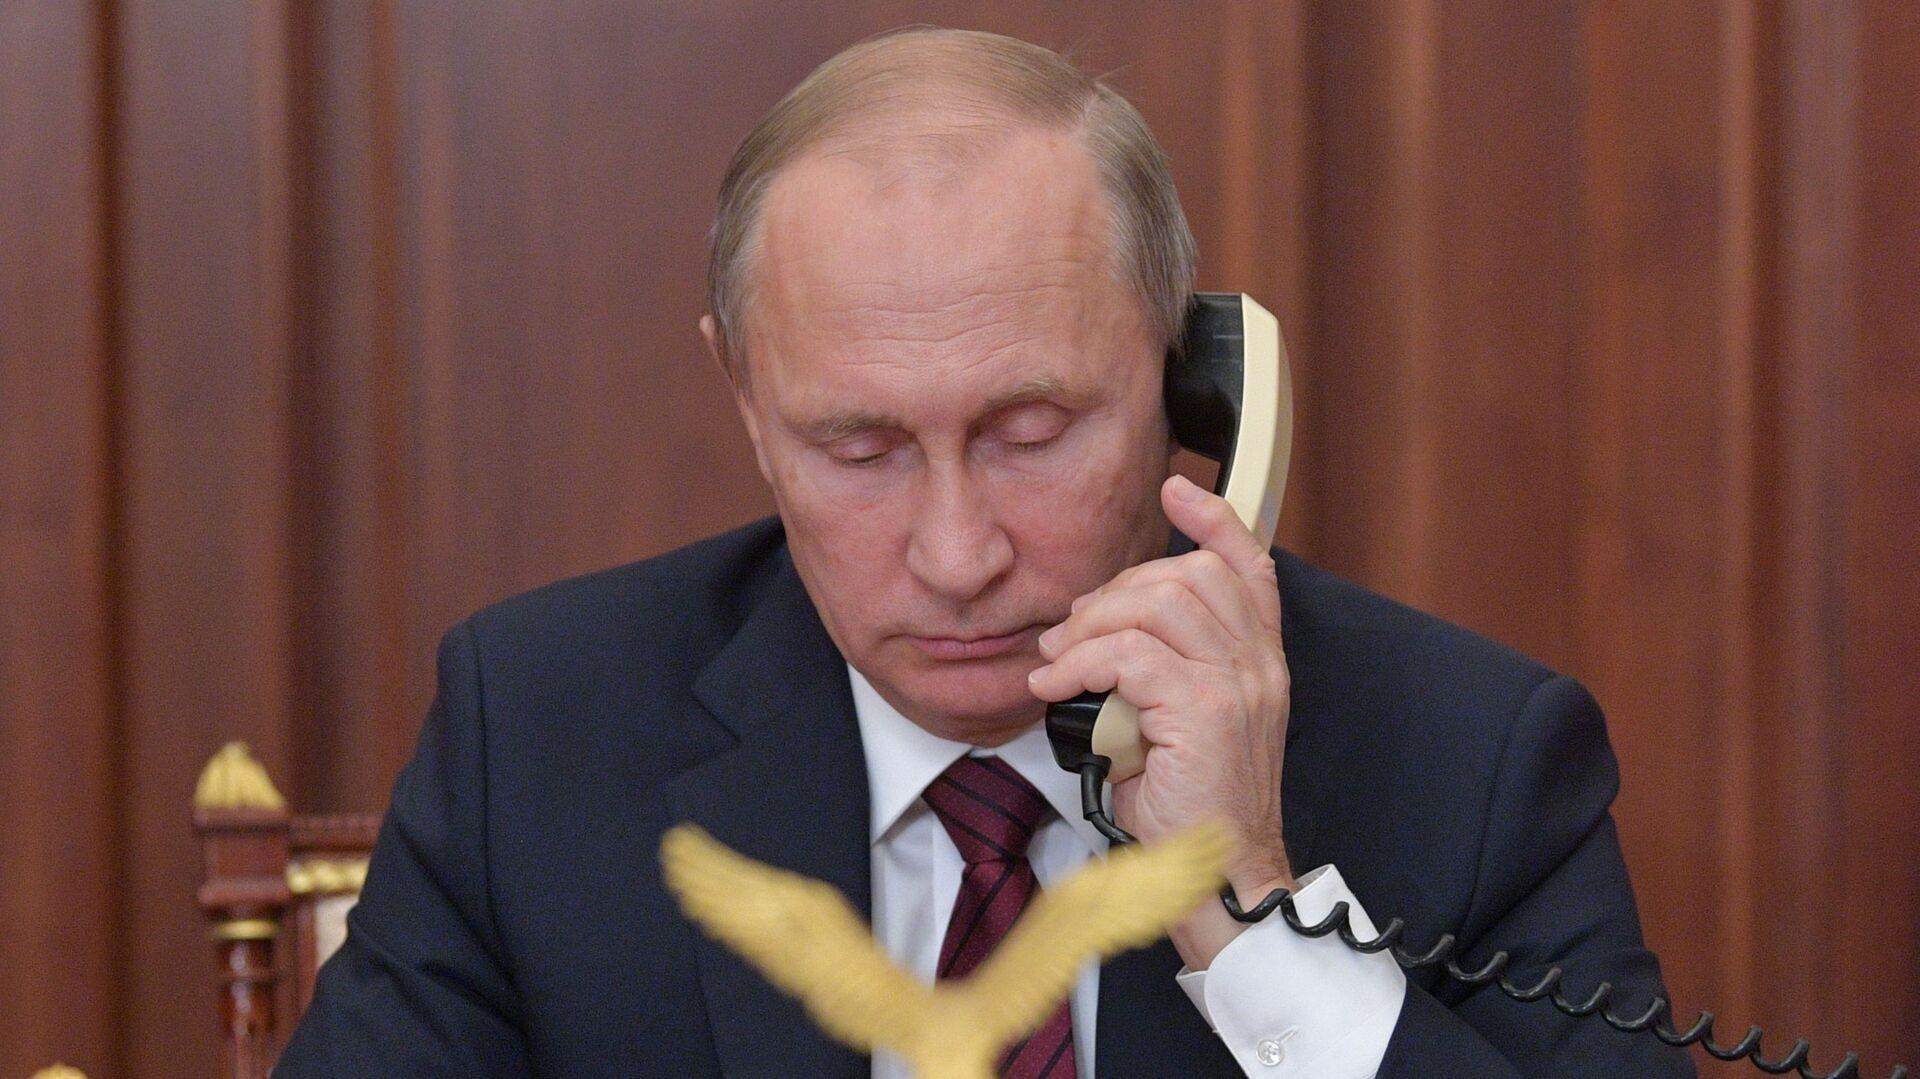 Президент РФ Владимир Путин во время телефонного разговора - Sputnik Тоҷикистон, 1920, 15.09.2021